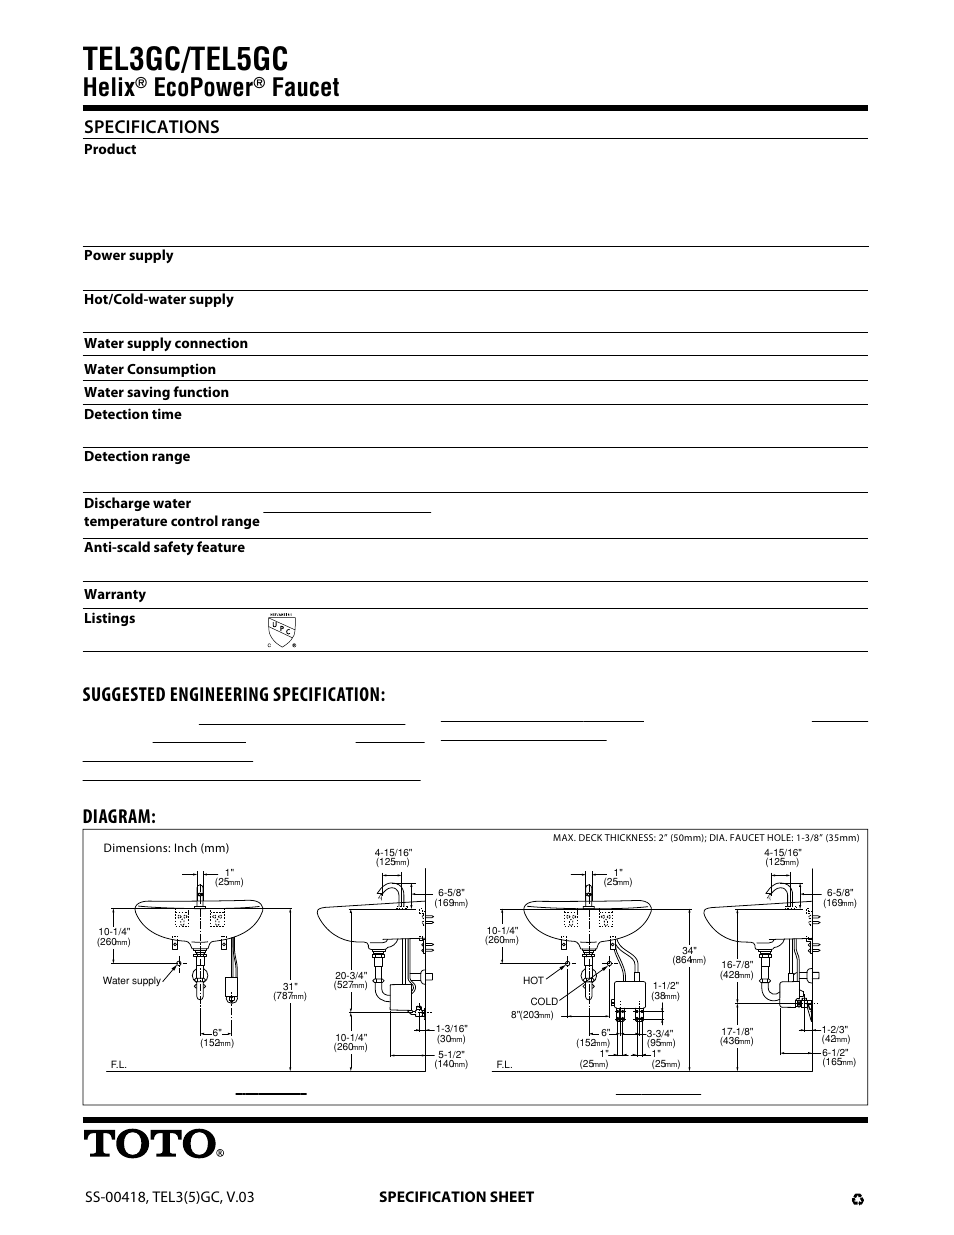 Tel3gc/tel5gc, Helix, Ecopower | Factory Direct Hardware Toto ...